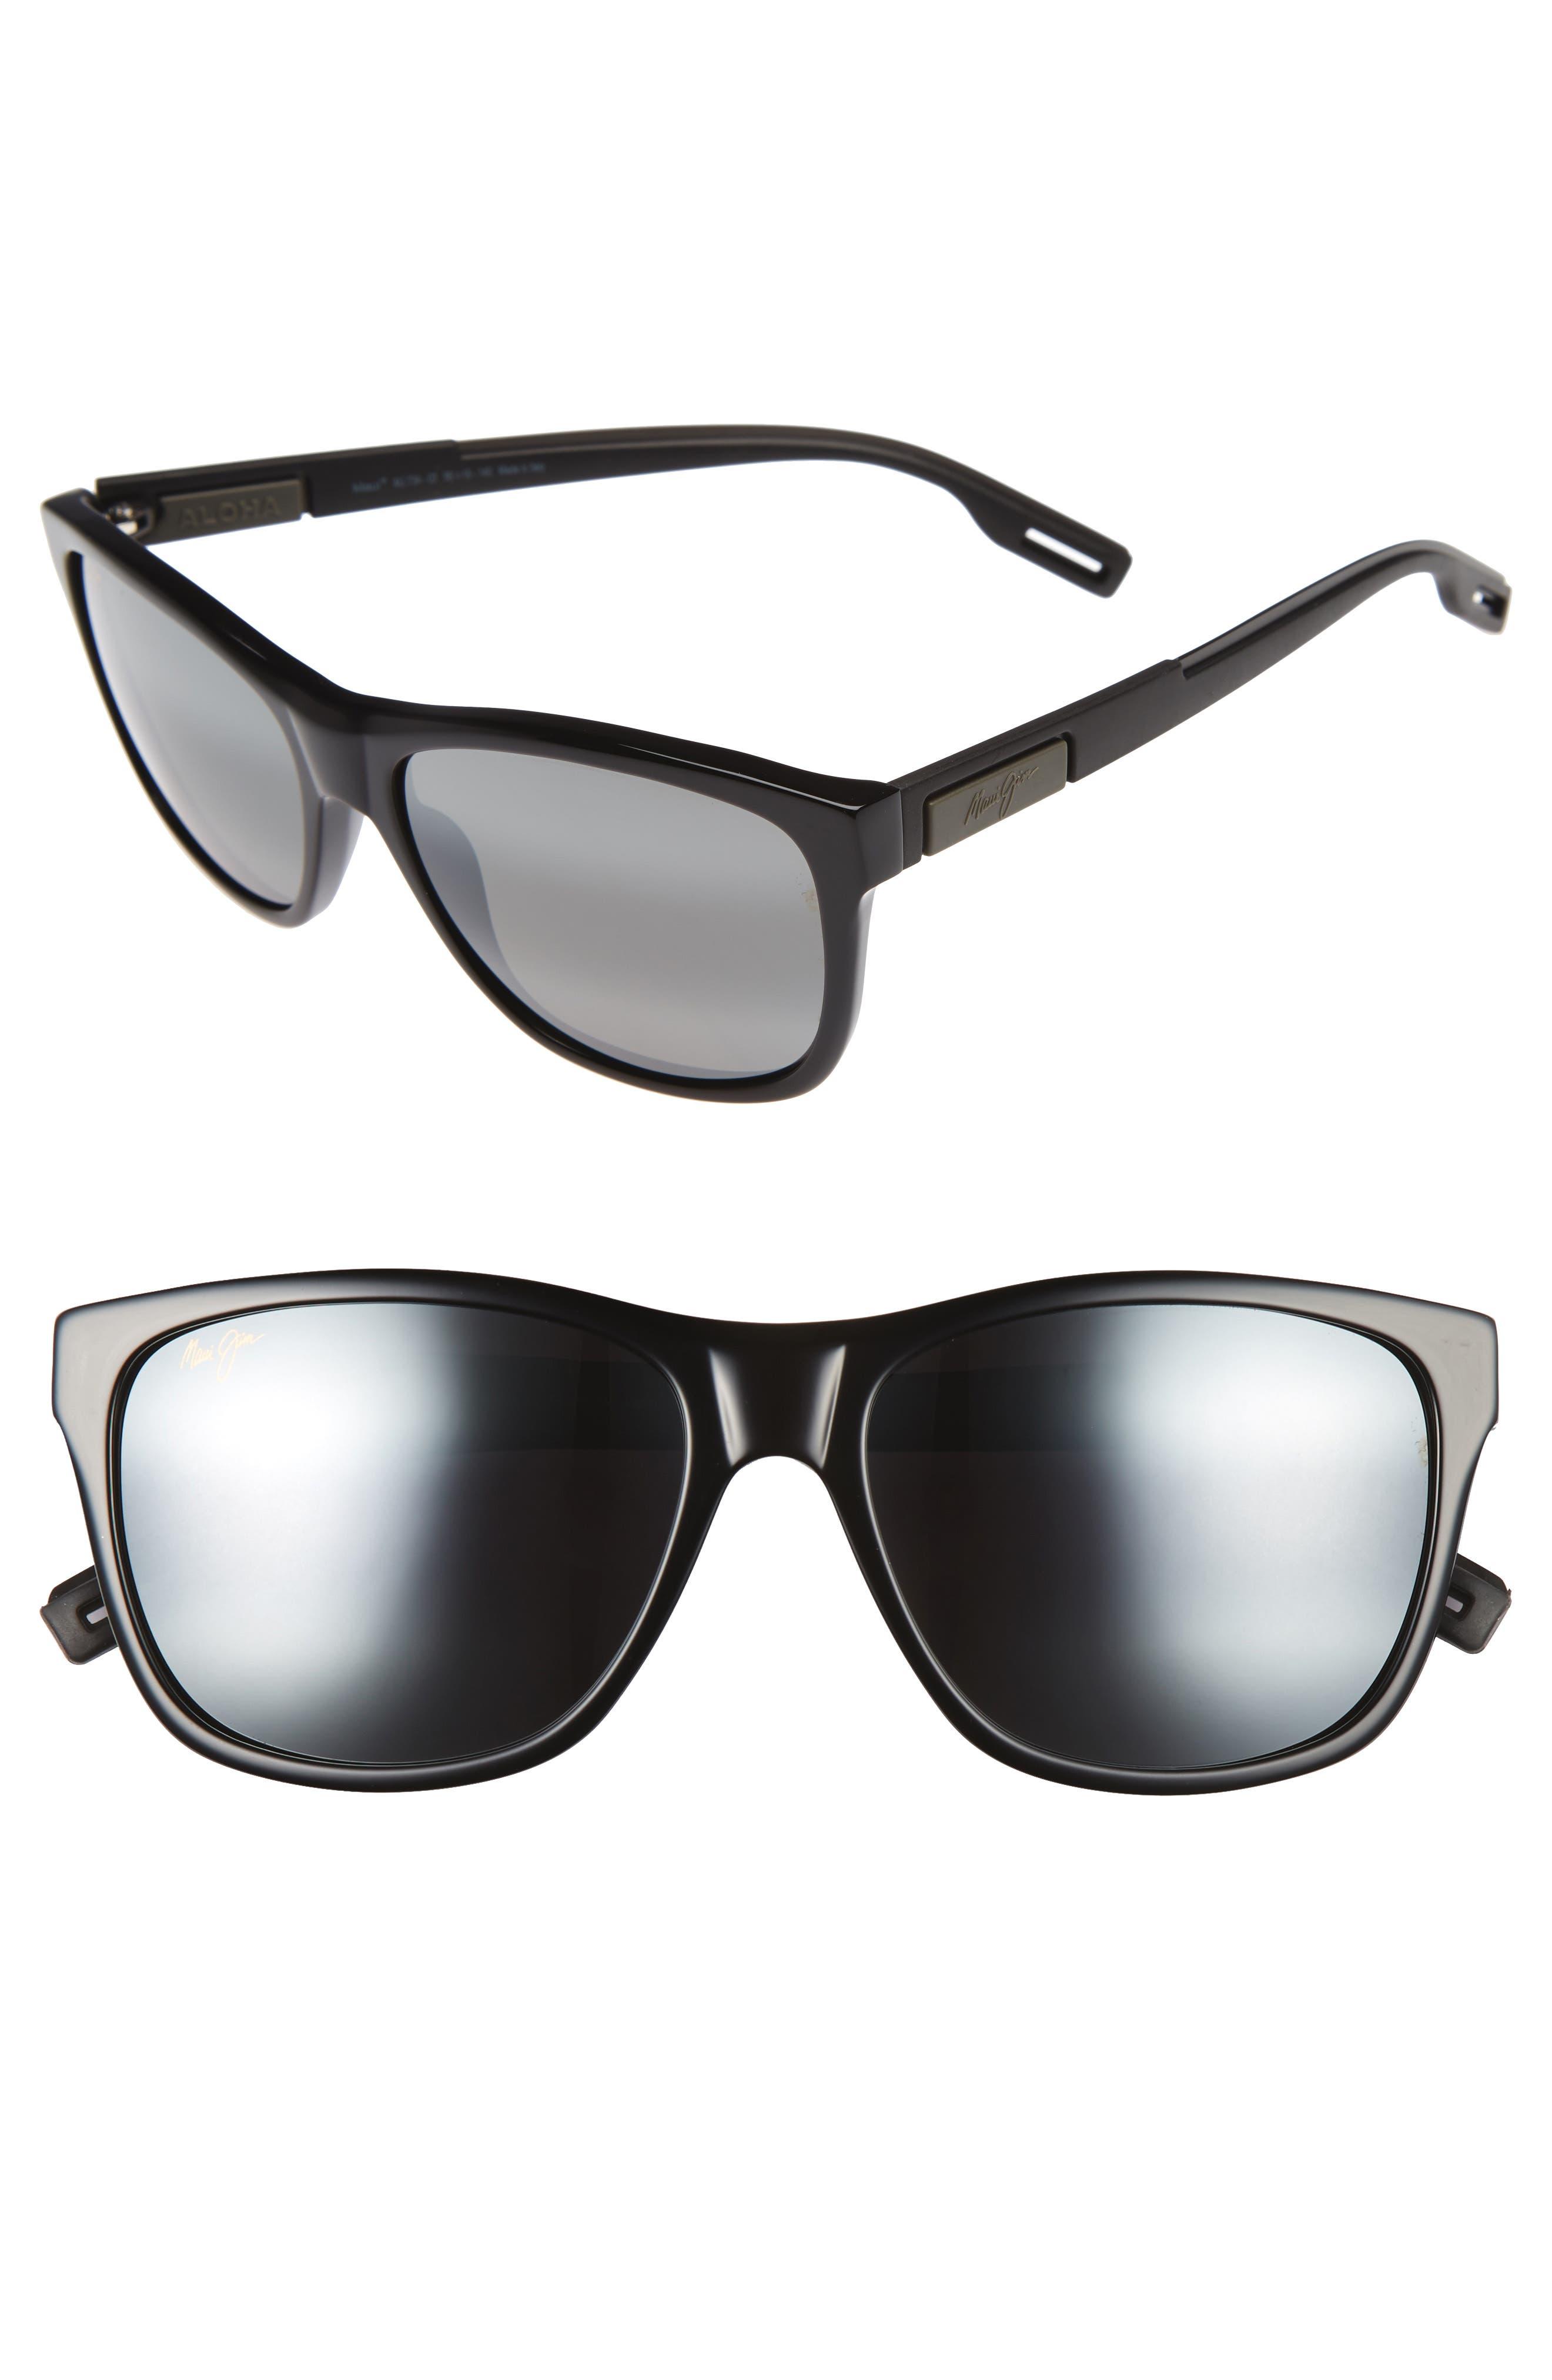 Howzit 56mm Polarized Gradient Sunglasses,                             Main thumbnail 1, color,                             GLOSS BLACK